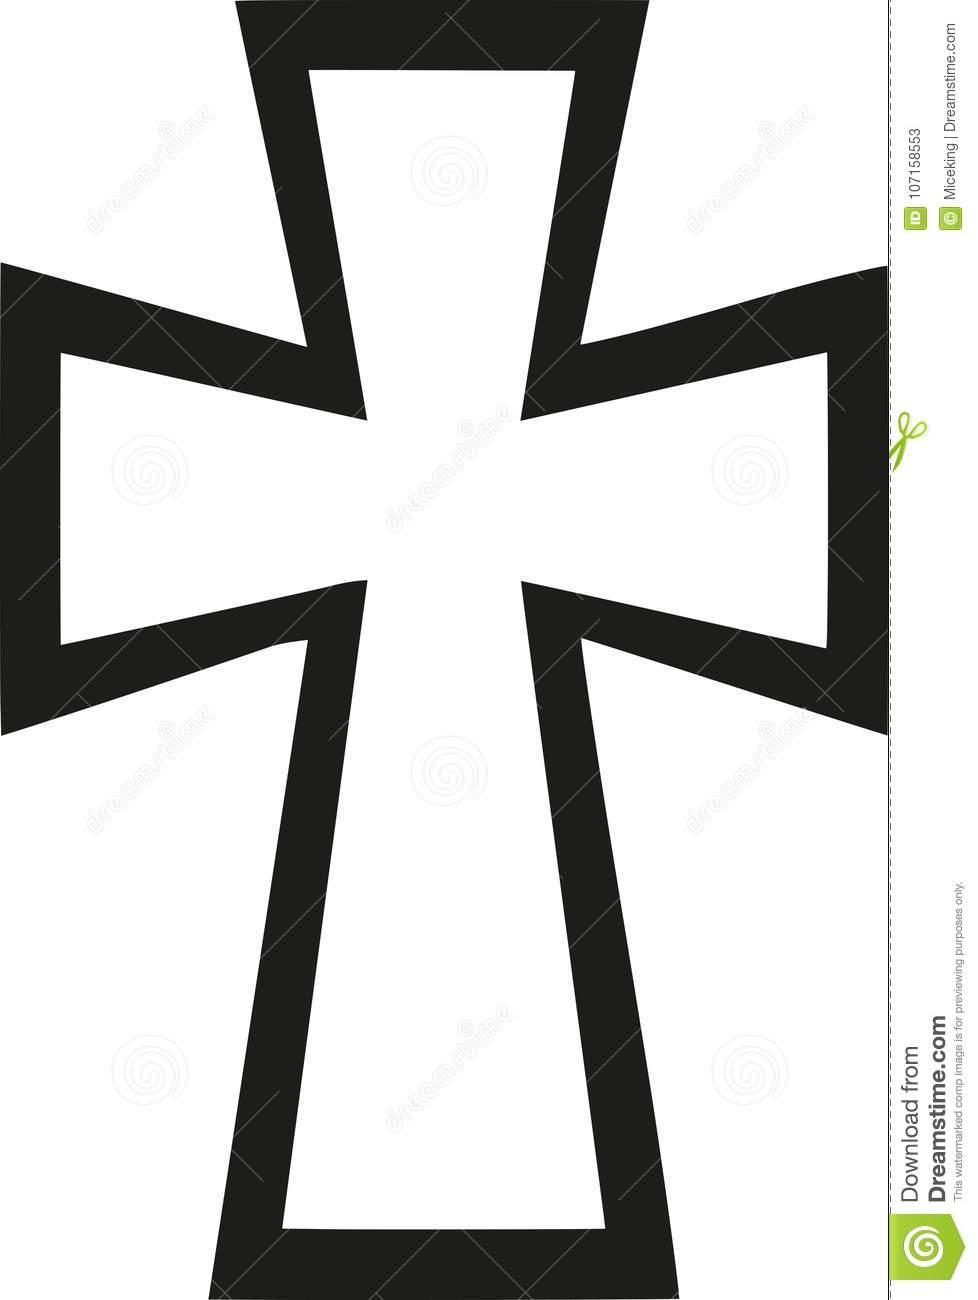 Byzantine Cross vector stock vector. Illustration of symbol.